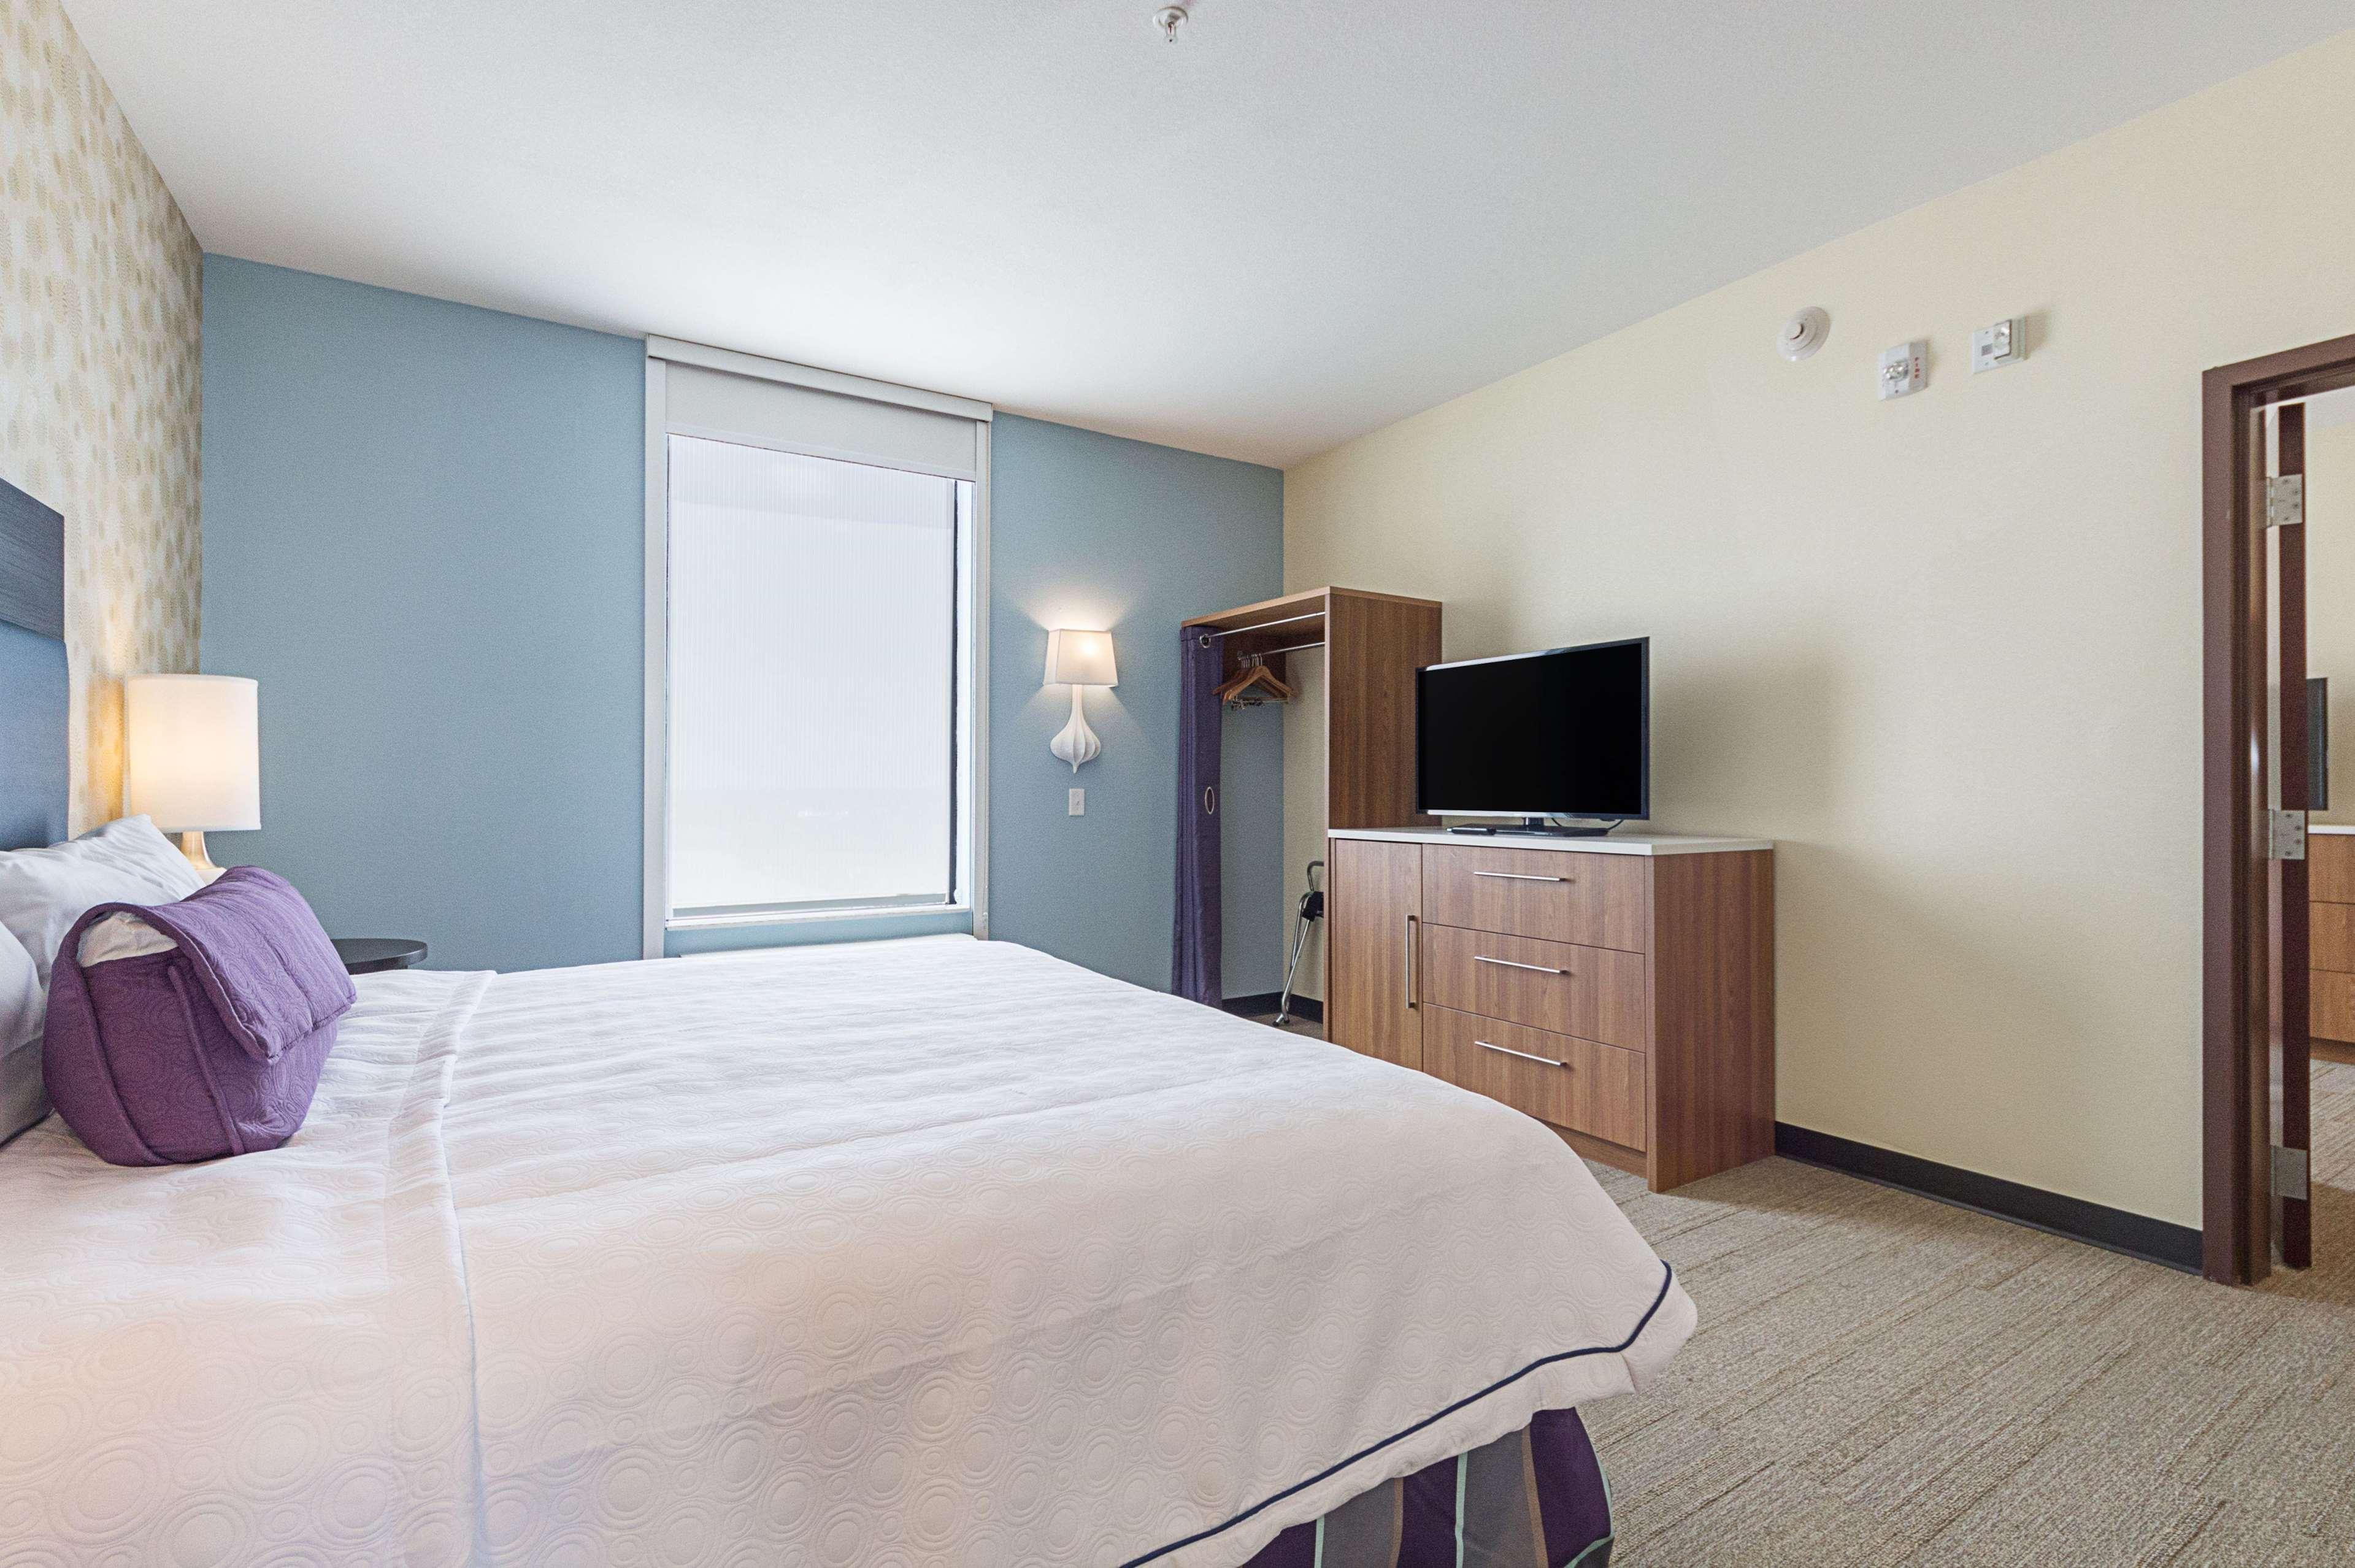 Home 2 Suites by Hilton - Yukon image 40